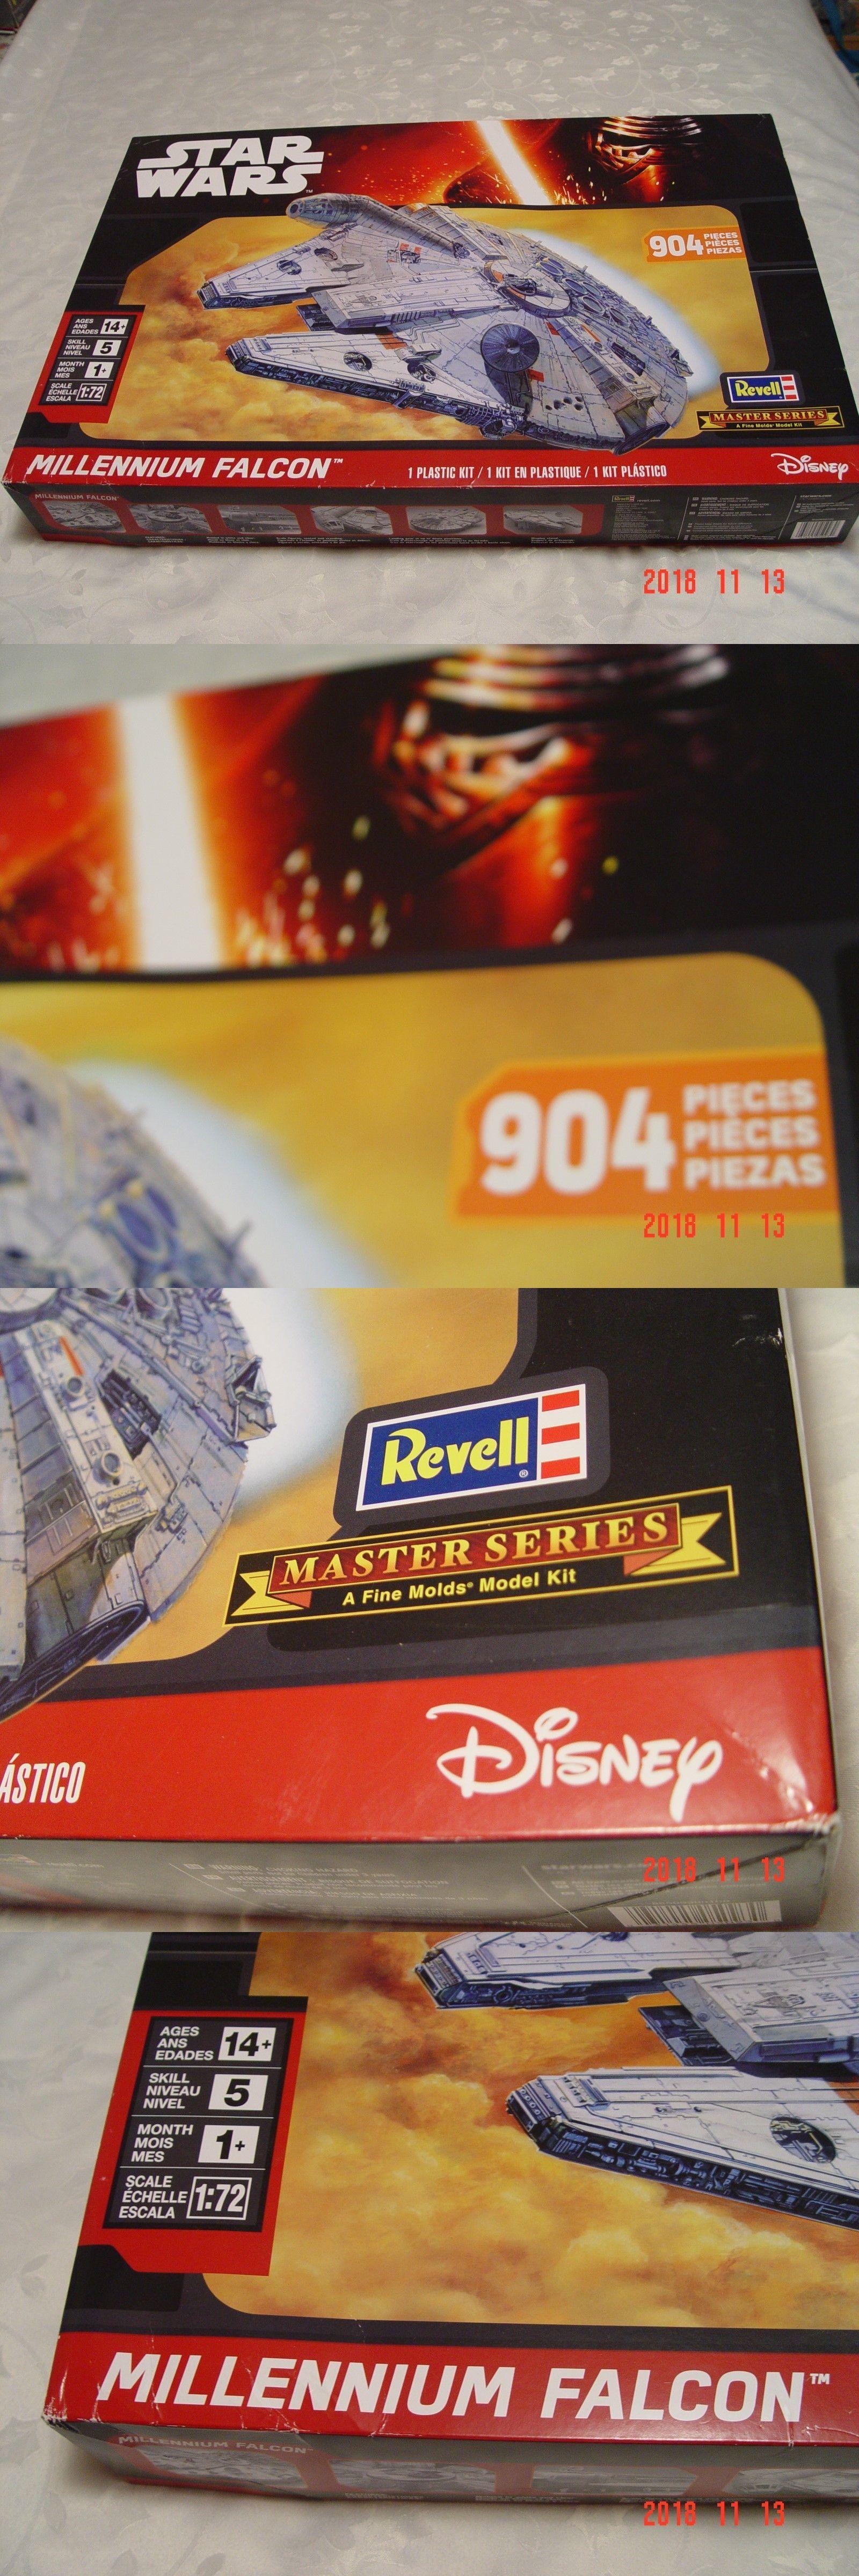 Star Wars 49212: 2015 Revell Master Series 1 72 Star Wars